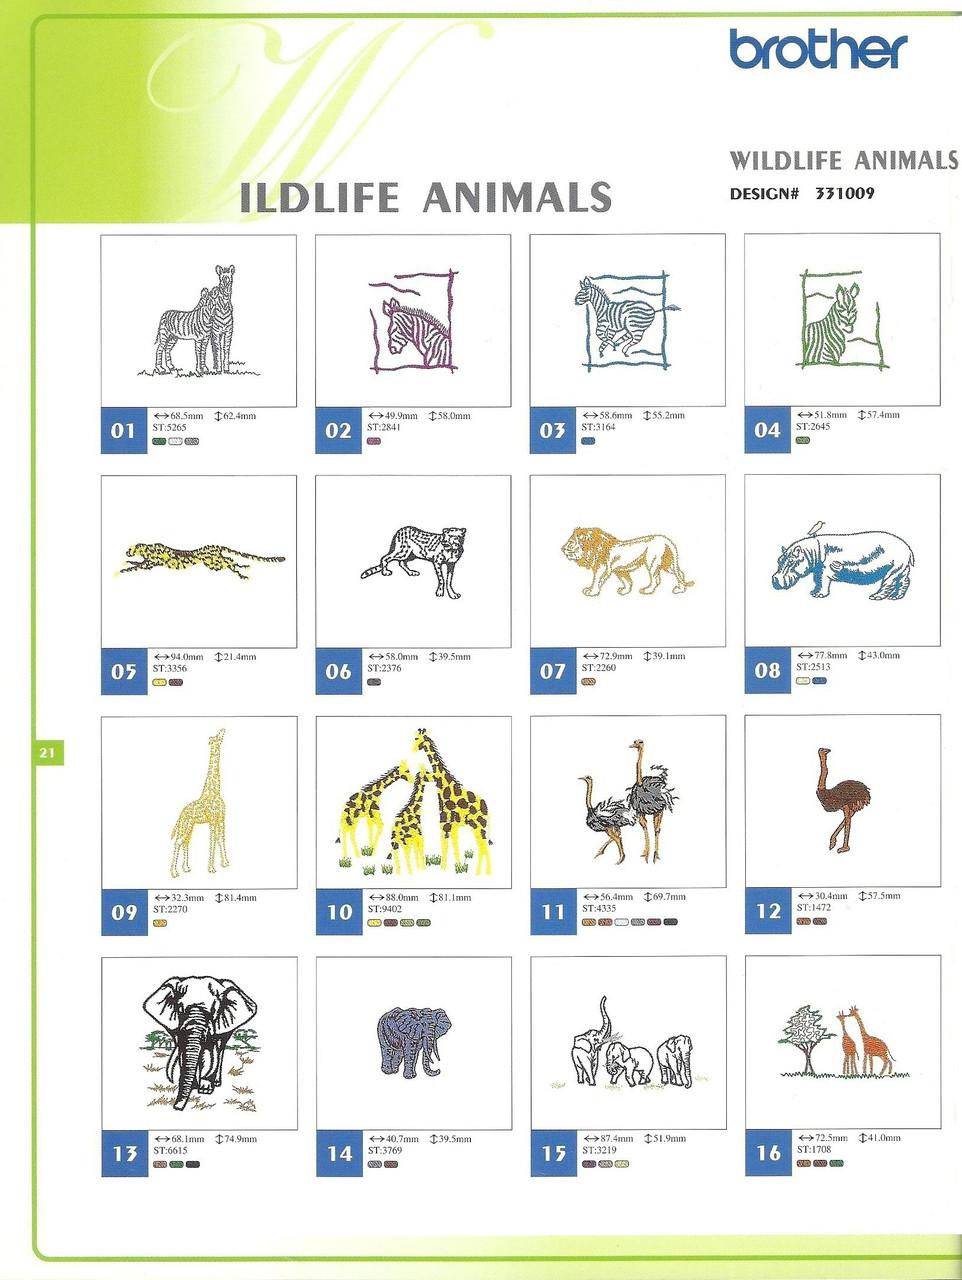 331009 Wildlife Animals